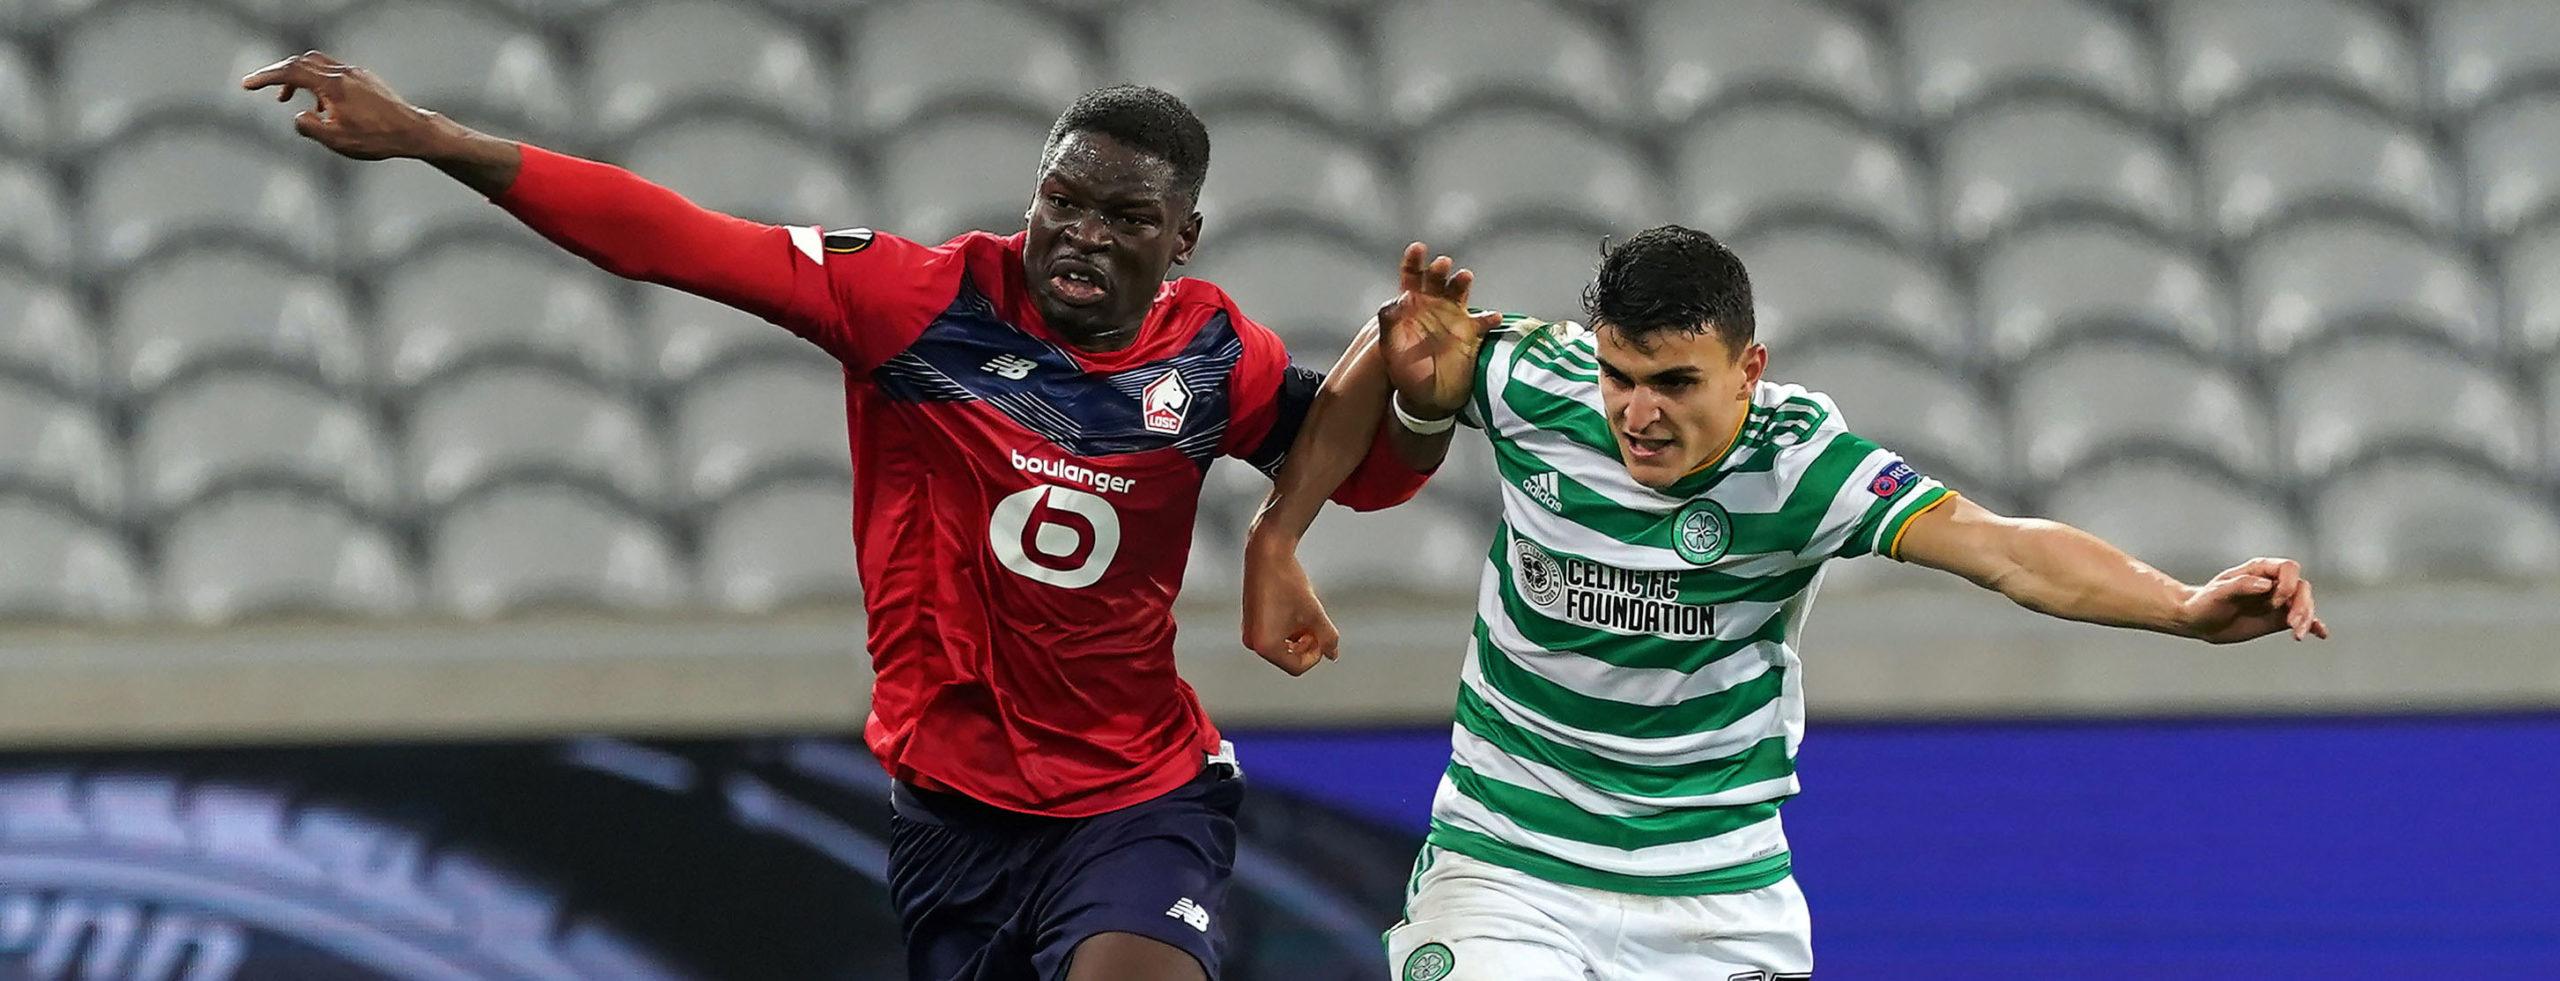 Celtic vs Lille: No relief for under-fire Lennon